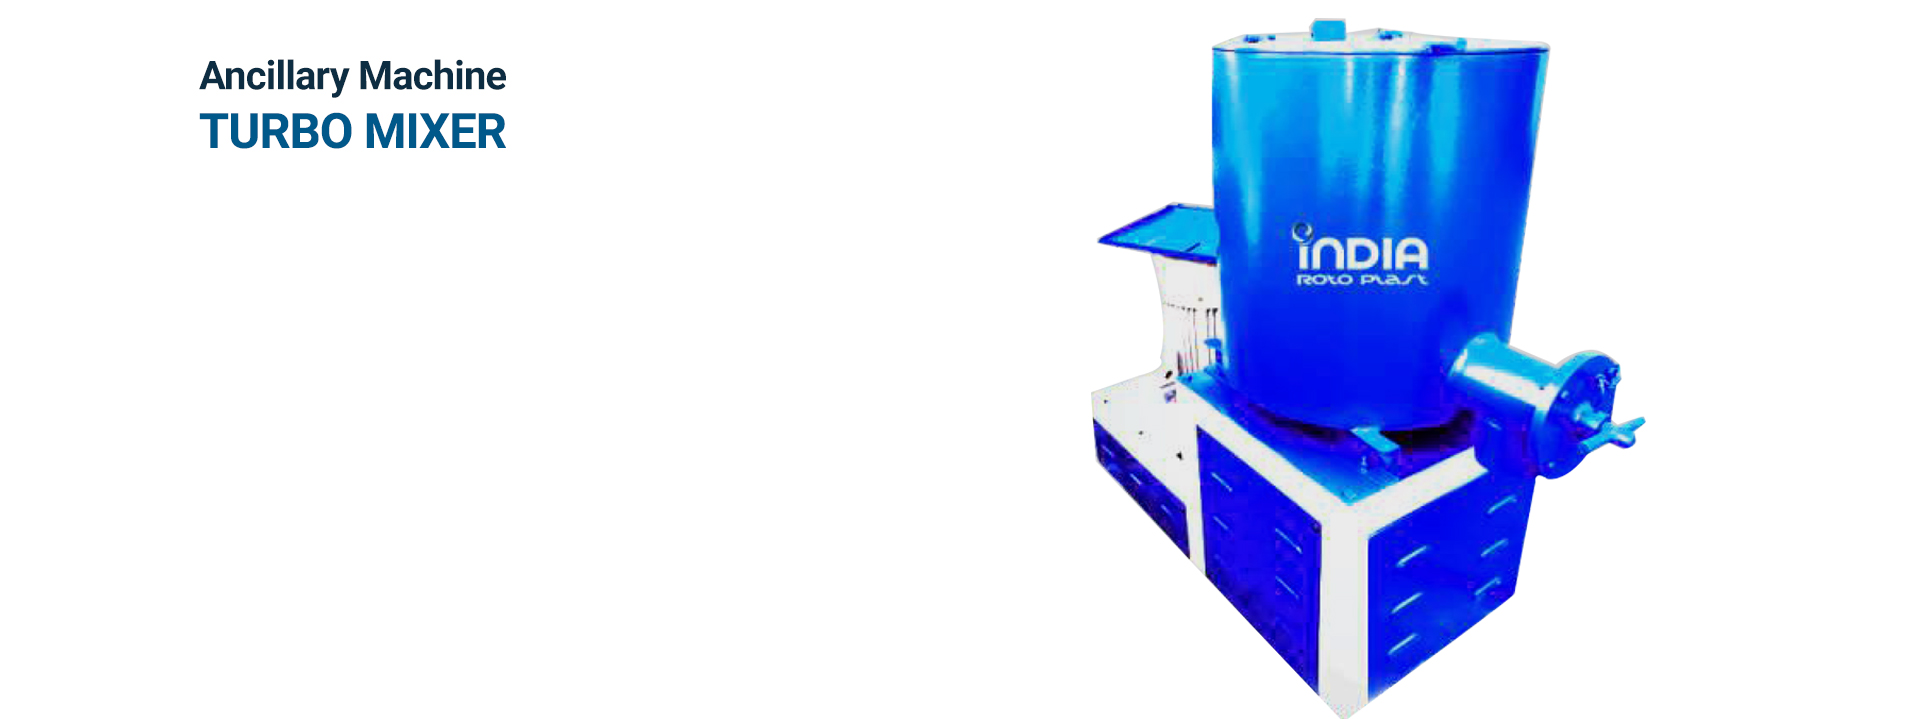 turbo mixer manufacturers in indiaturbo mixer manufacturers